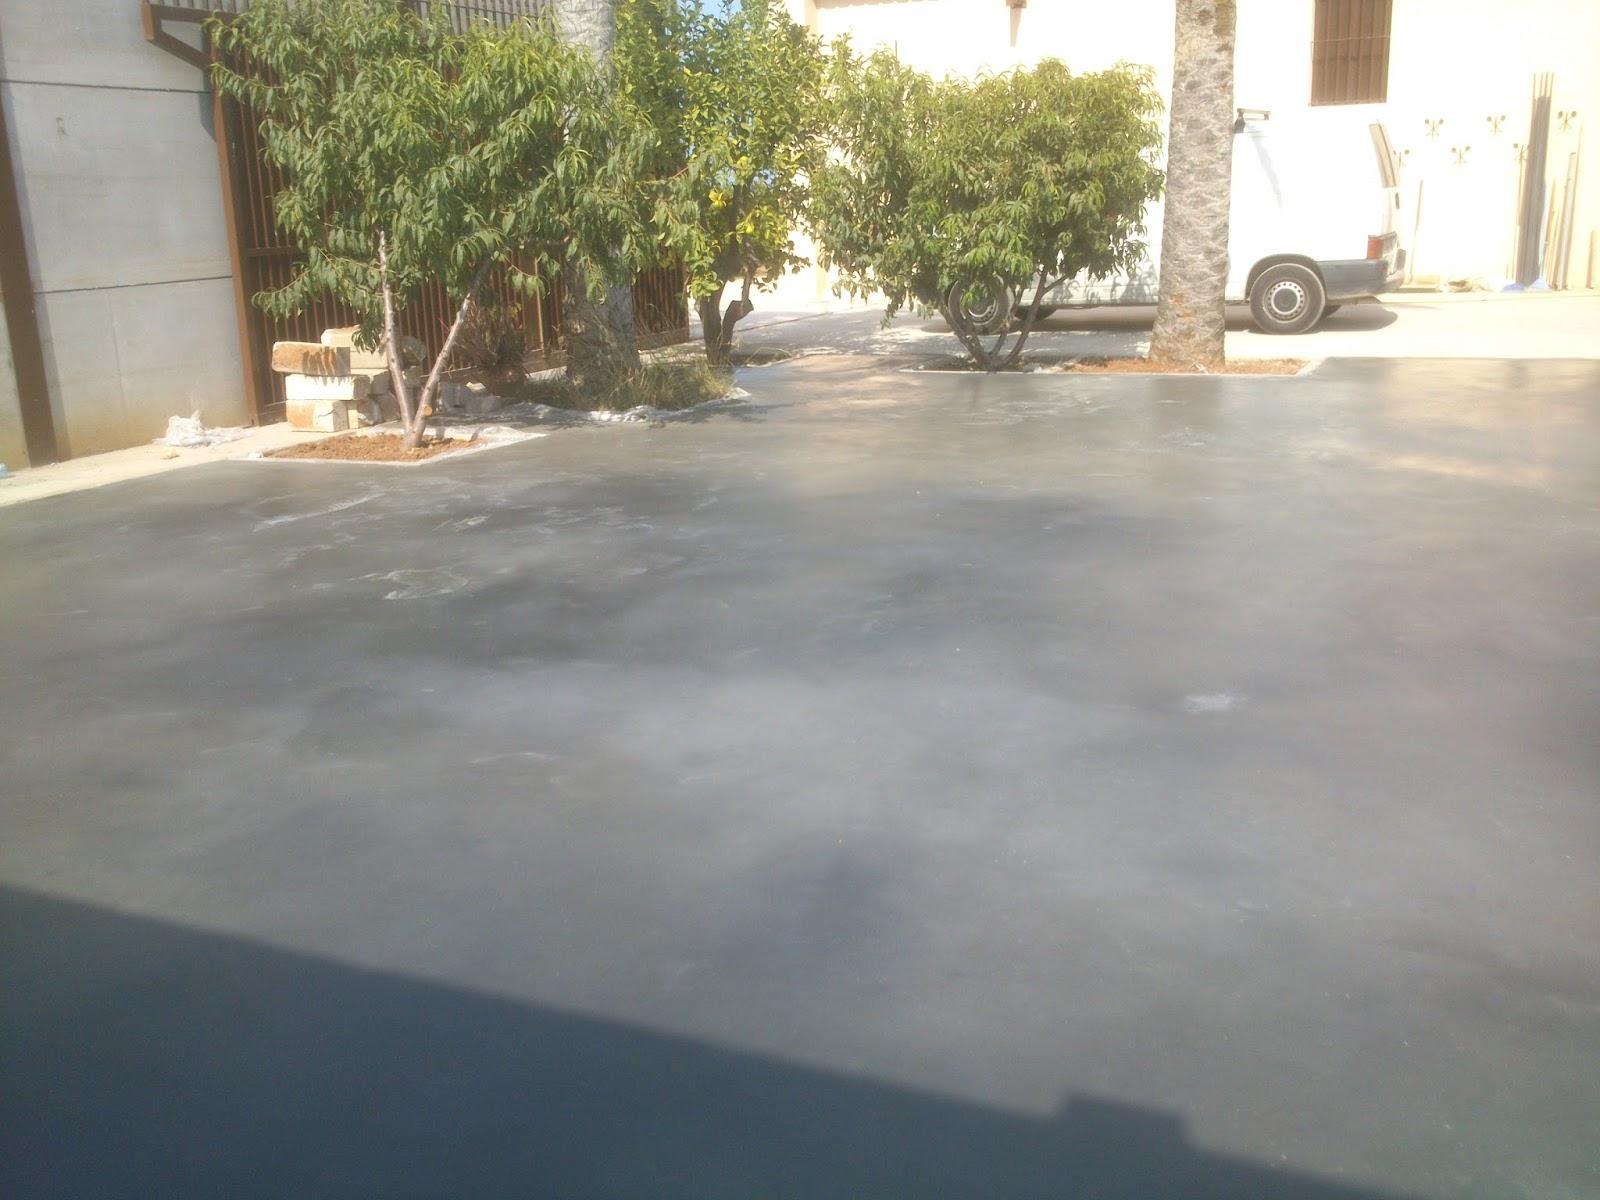 Pavimento continuo de hormig n liso en denia color gris - Helicoptero para hormigon ...